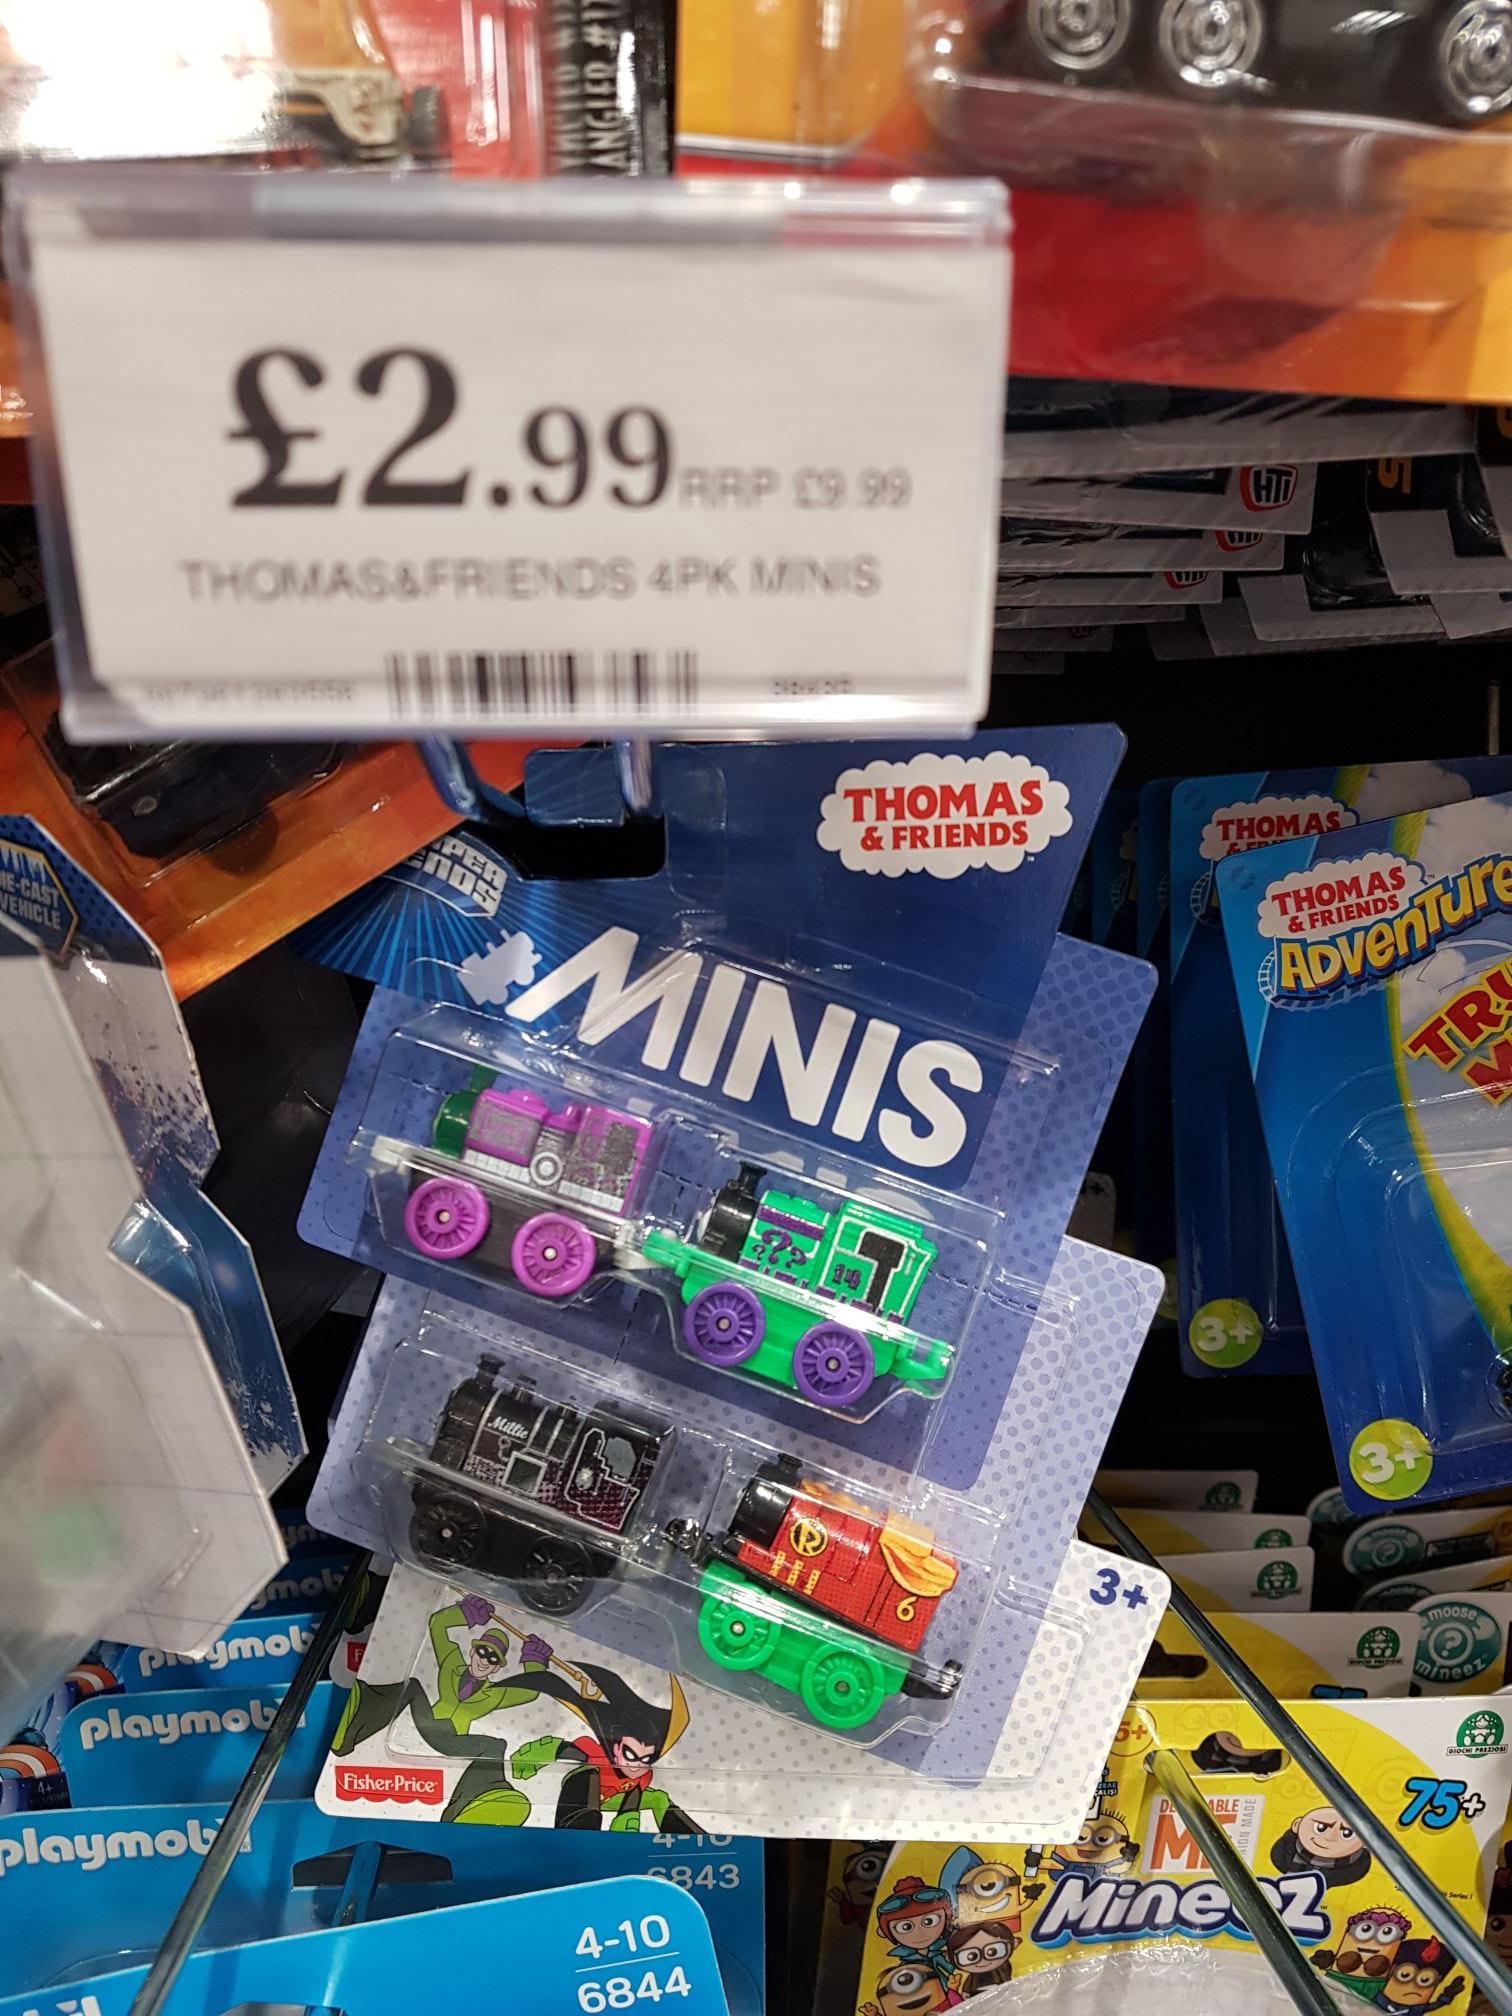 Thomas & Friends DC Comics Minis 4 Pack - £2.99 instore @ Home Bargains